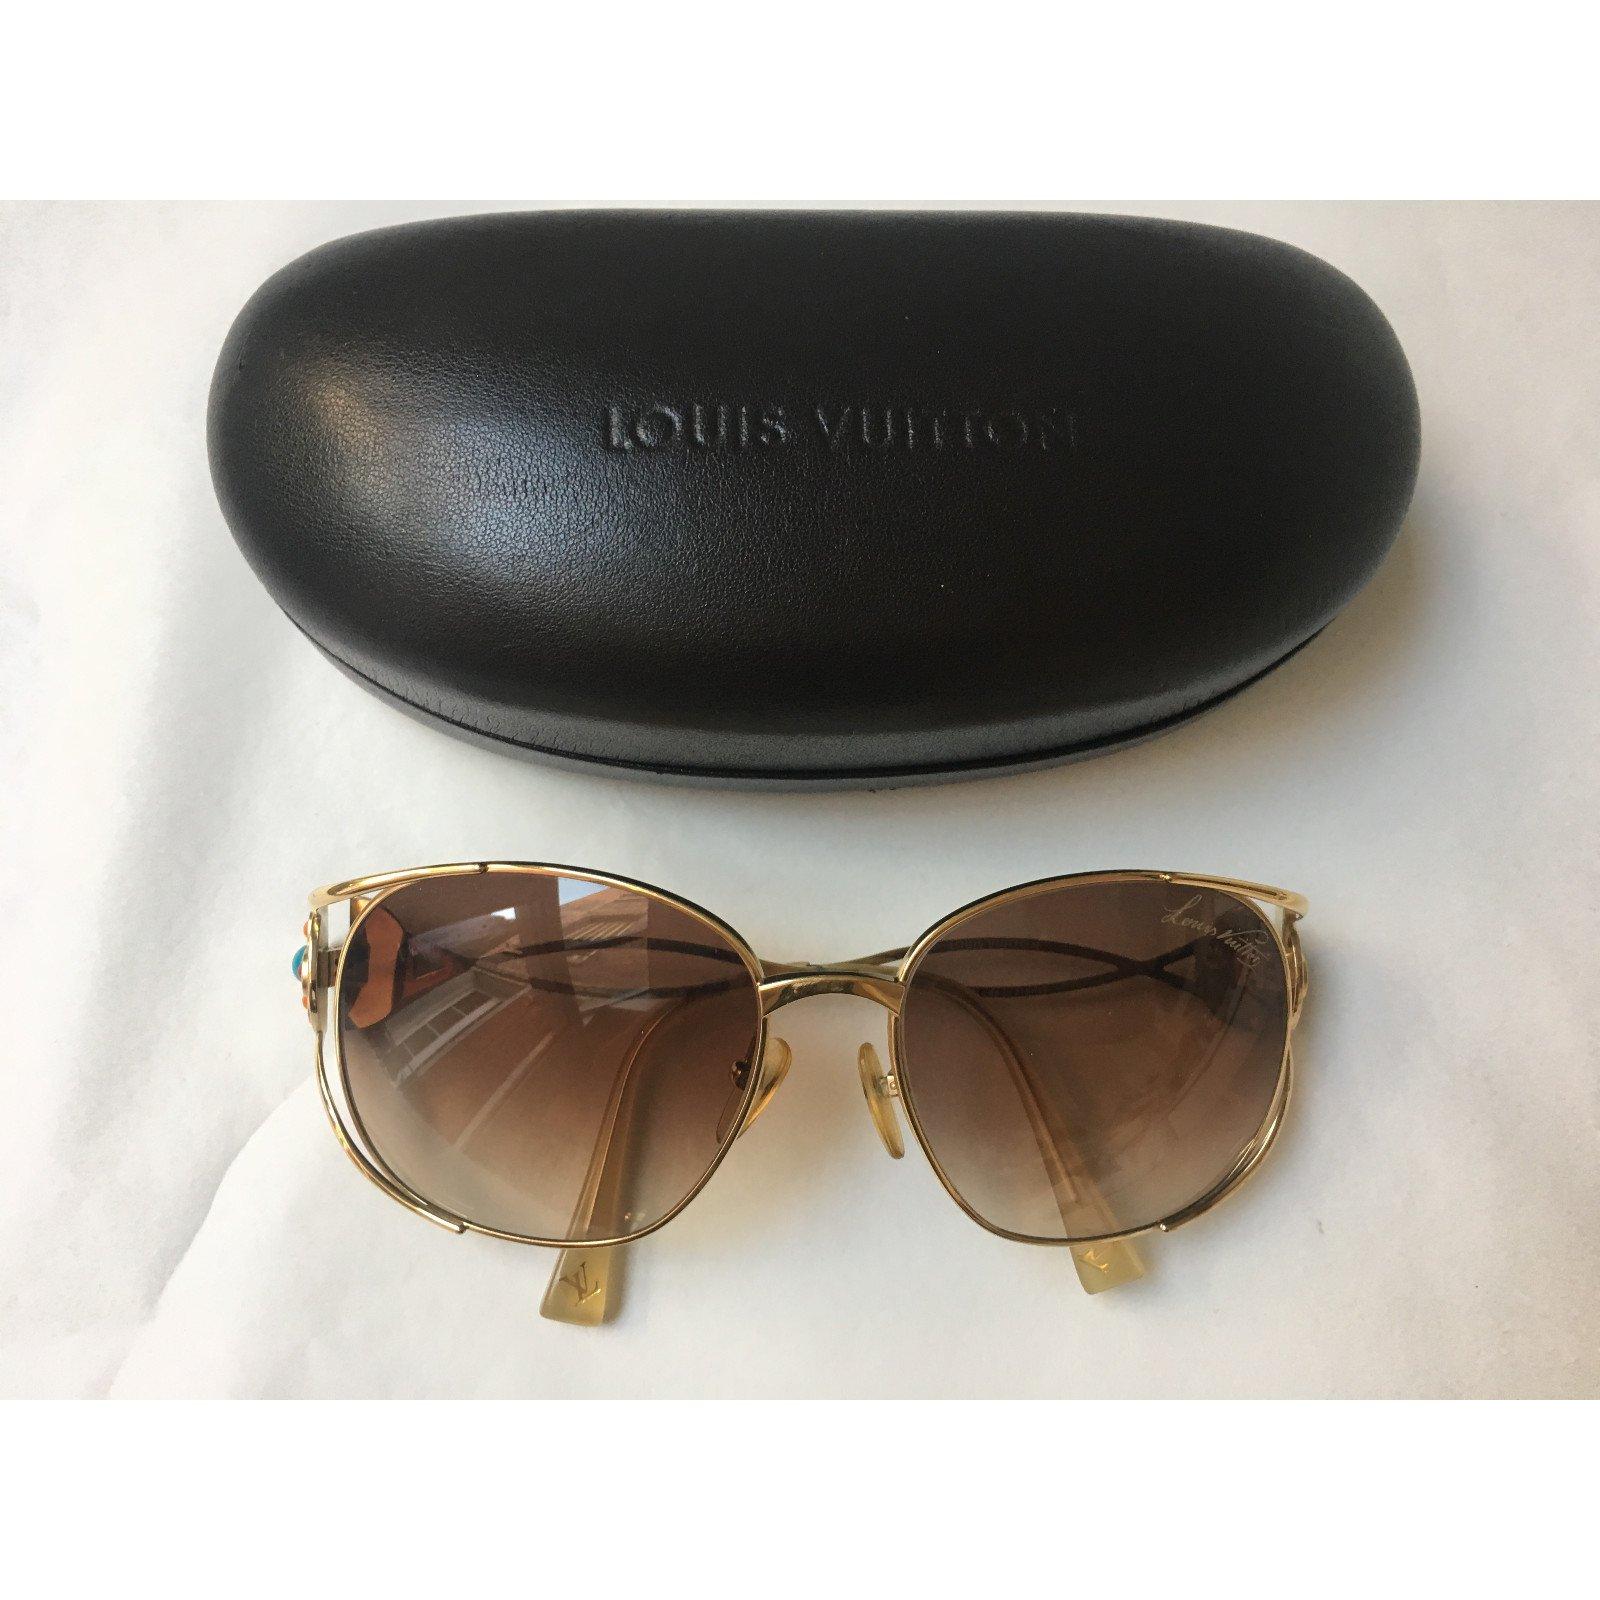 ec22a212ee3 Louis Vuitton Wayfarer Style Sunglasses